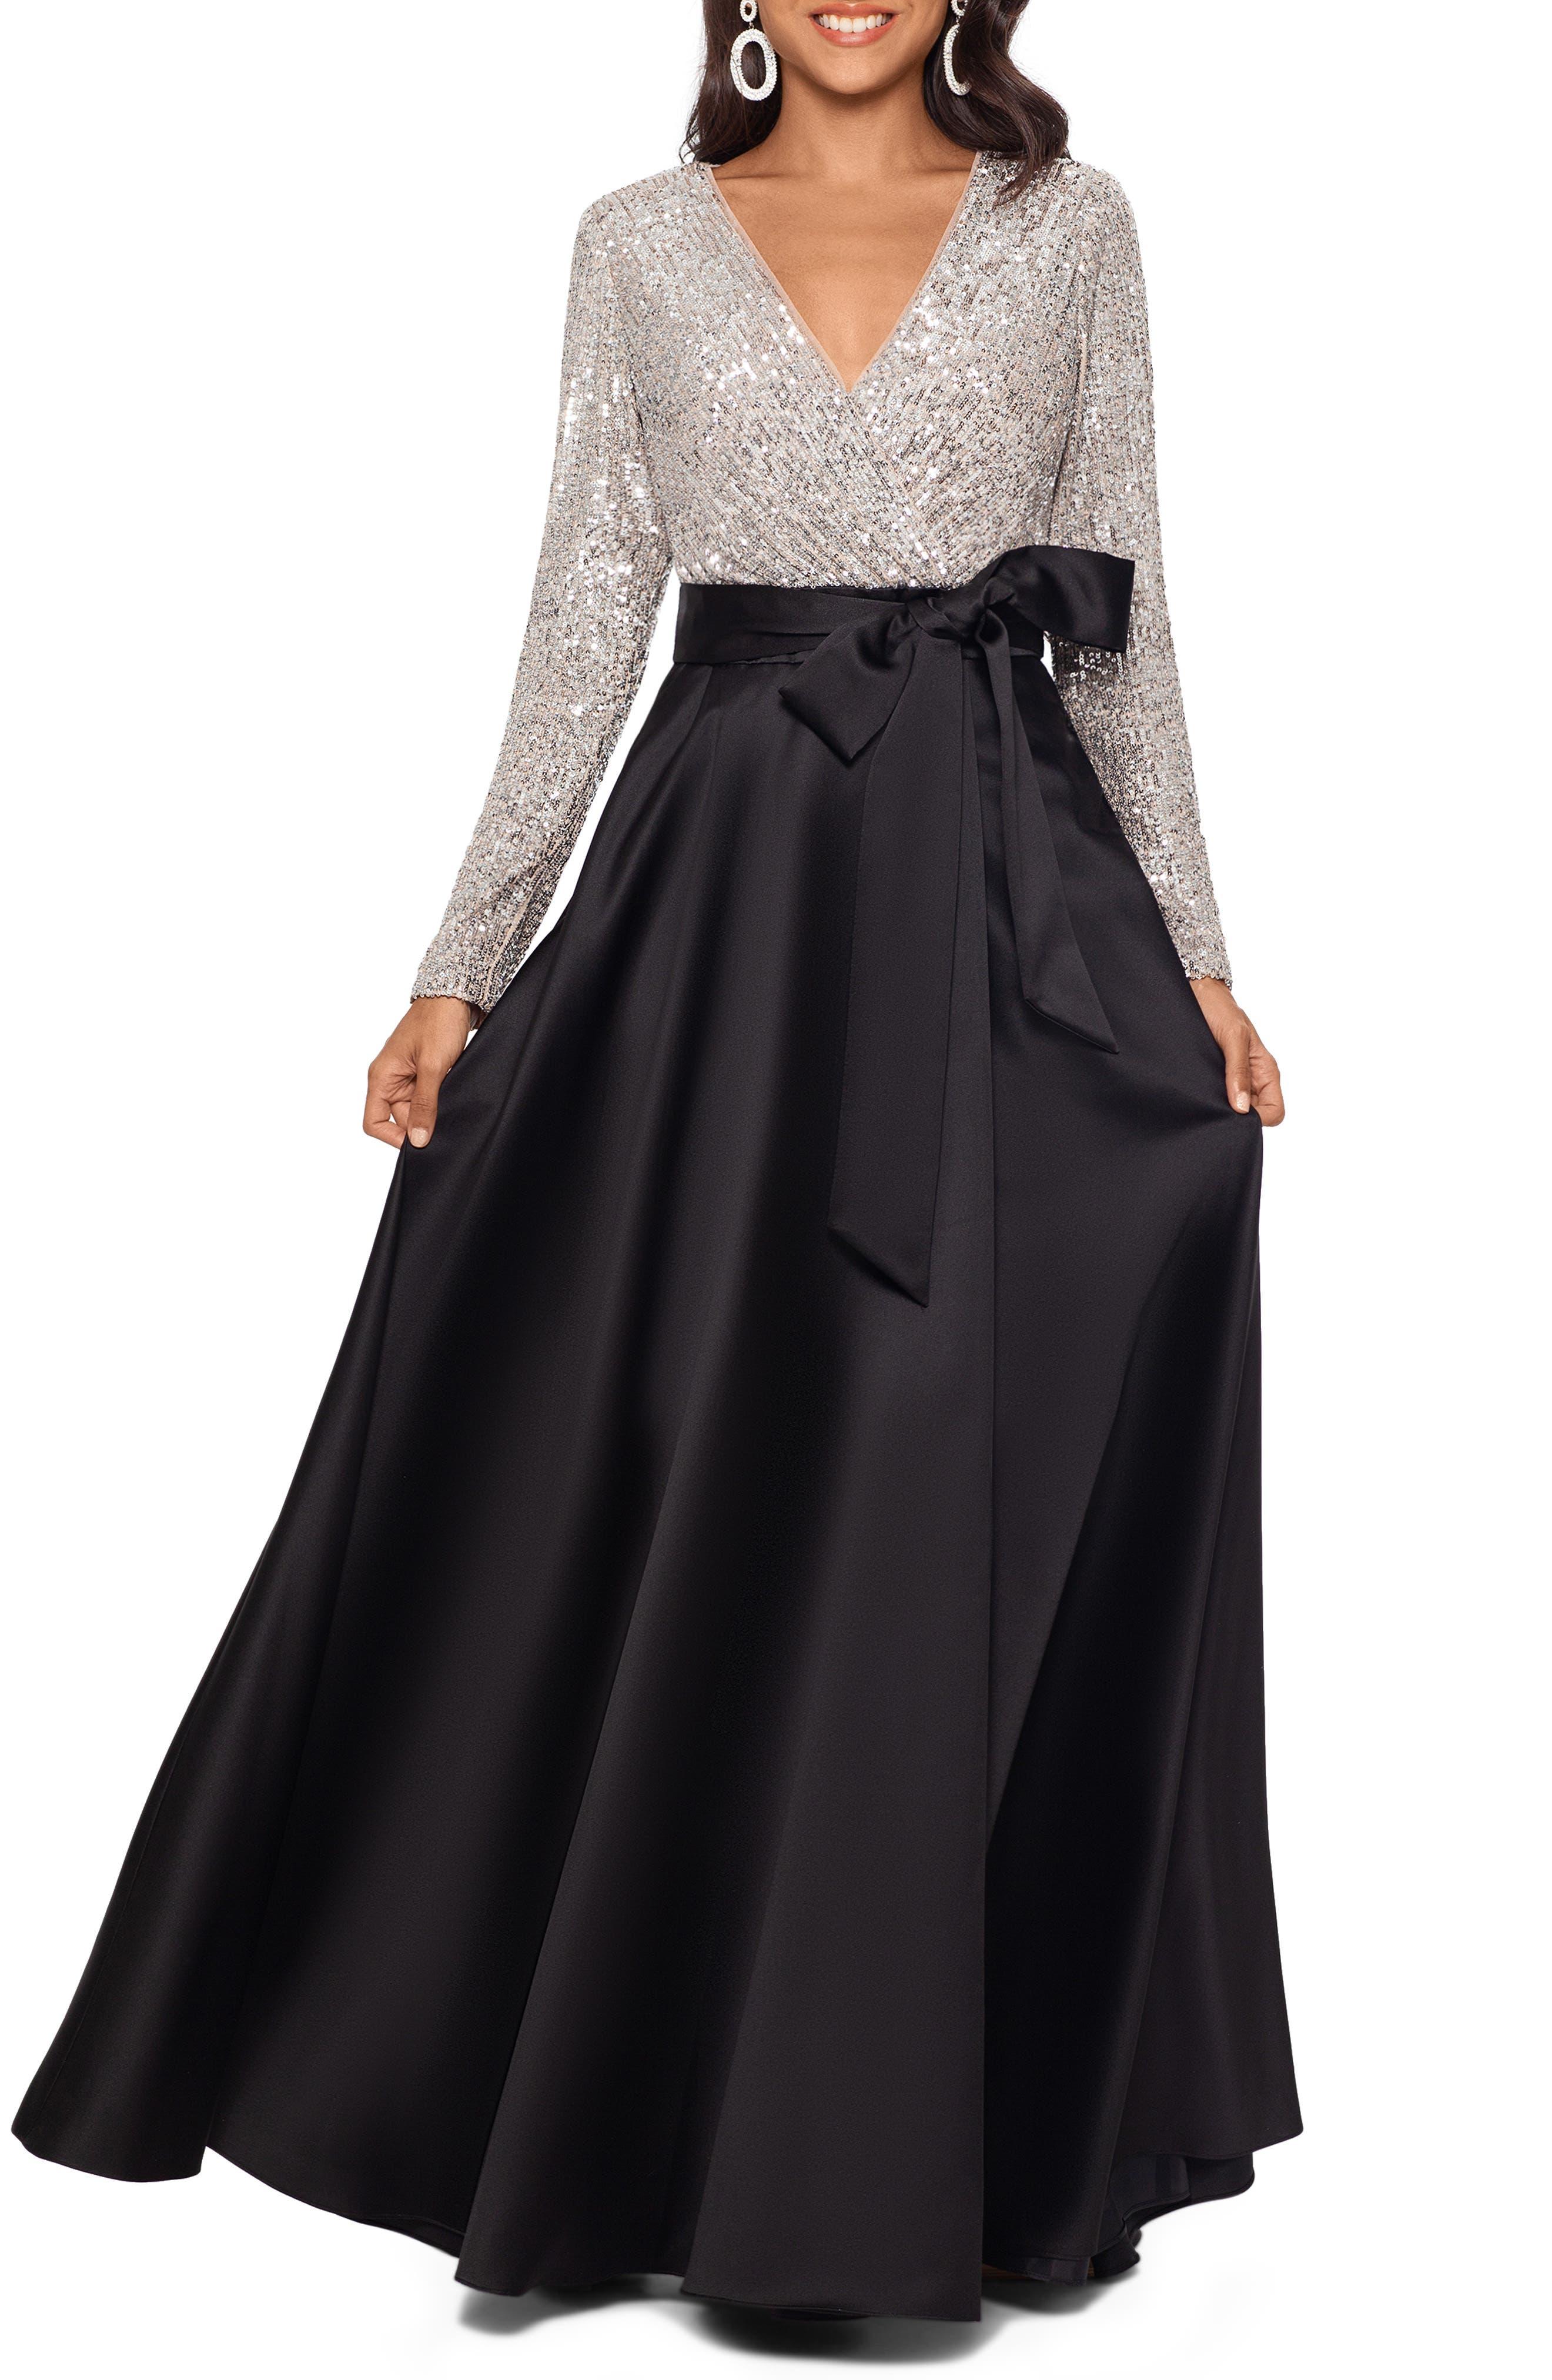 Xscape Long Sleeve Sequin Ballgown